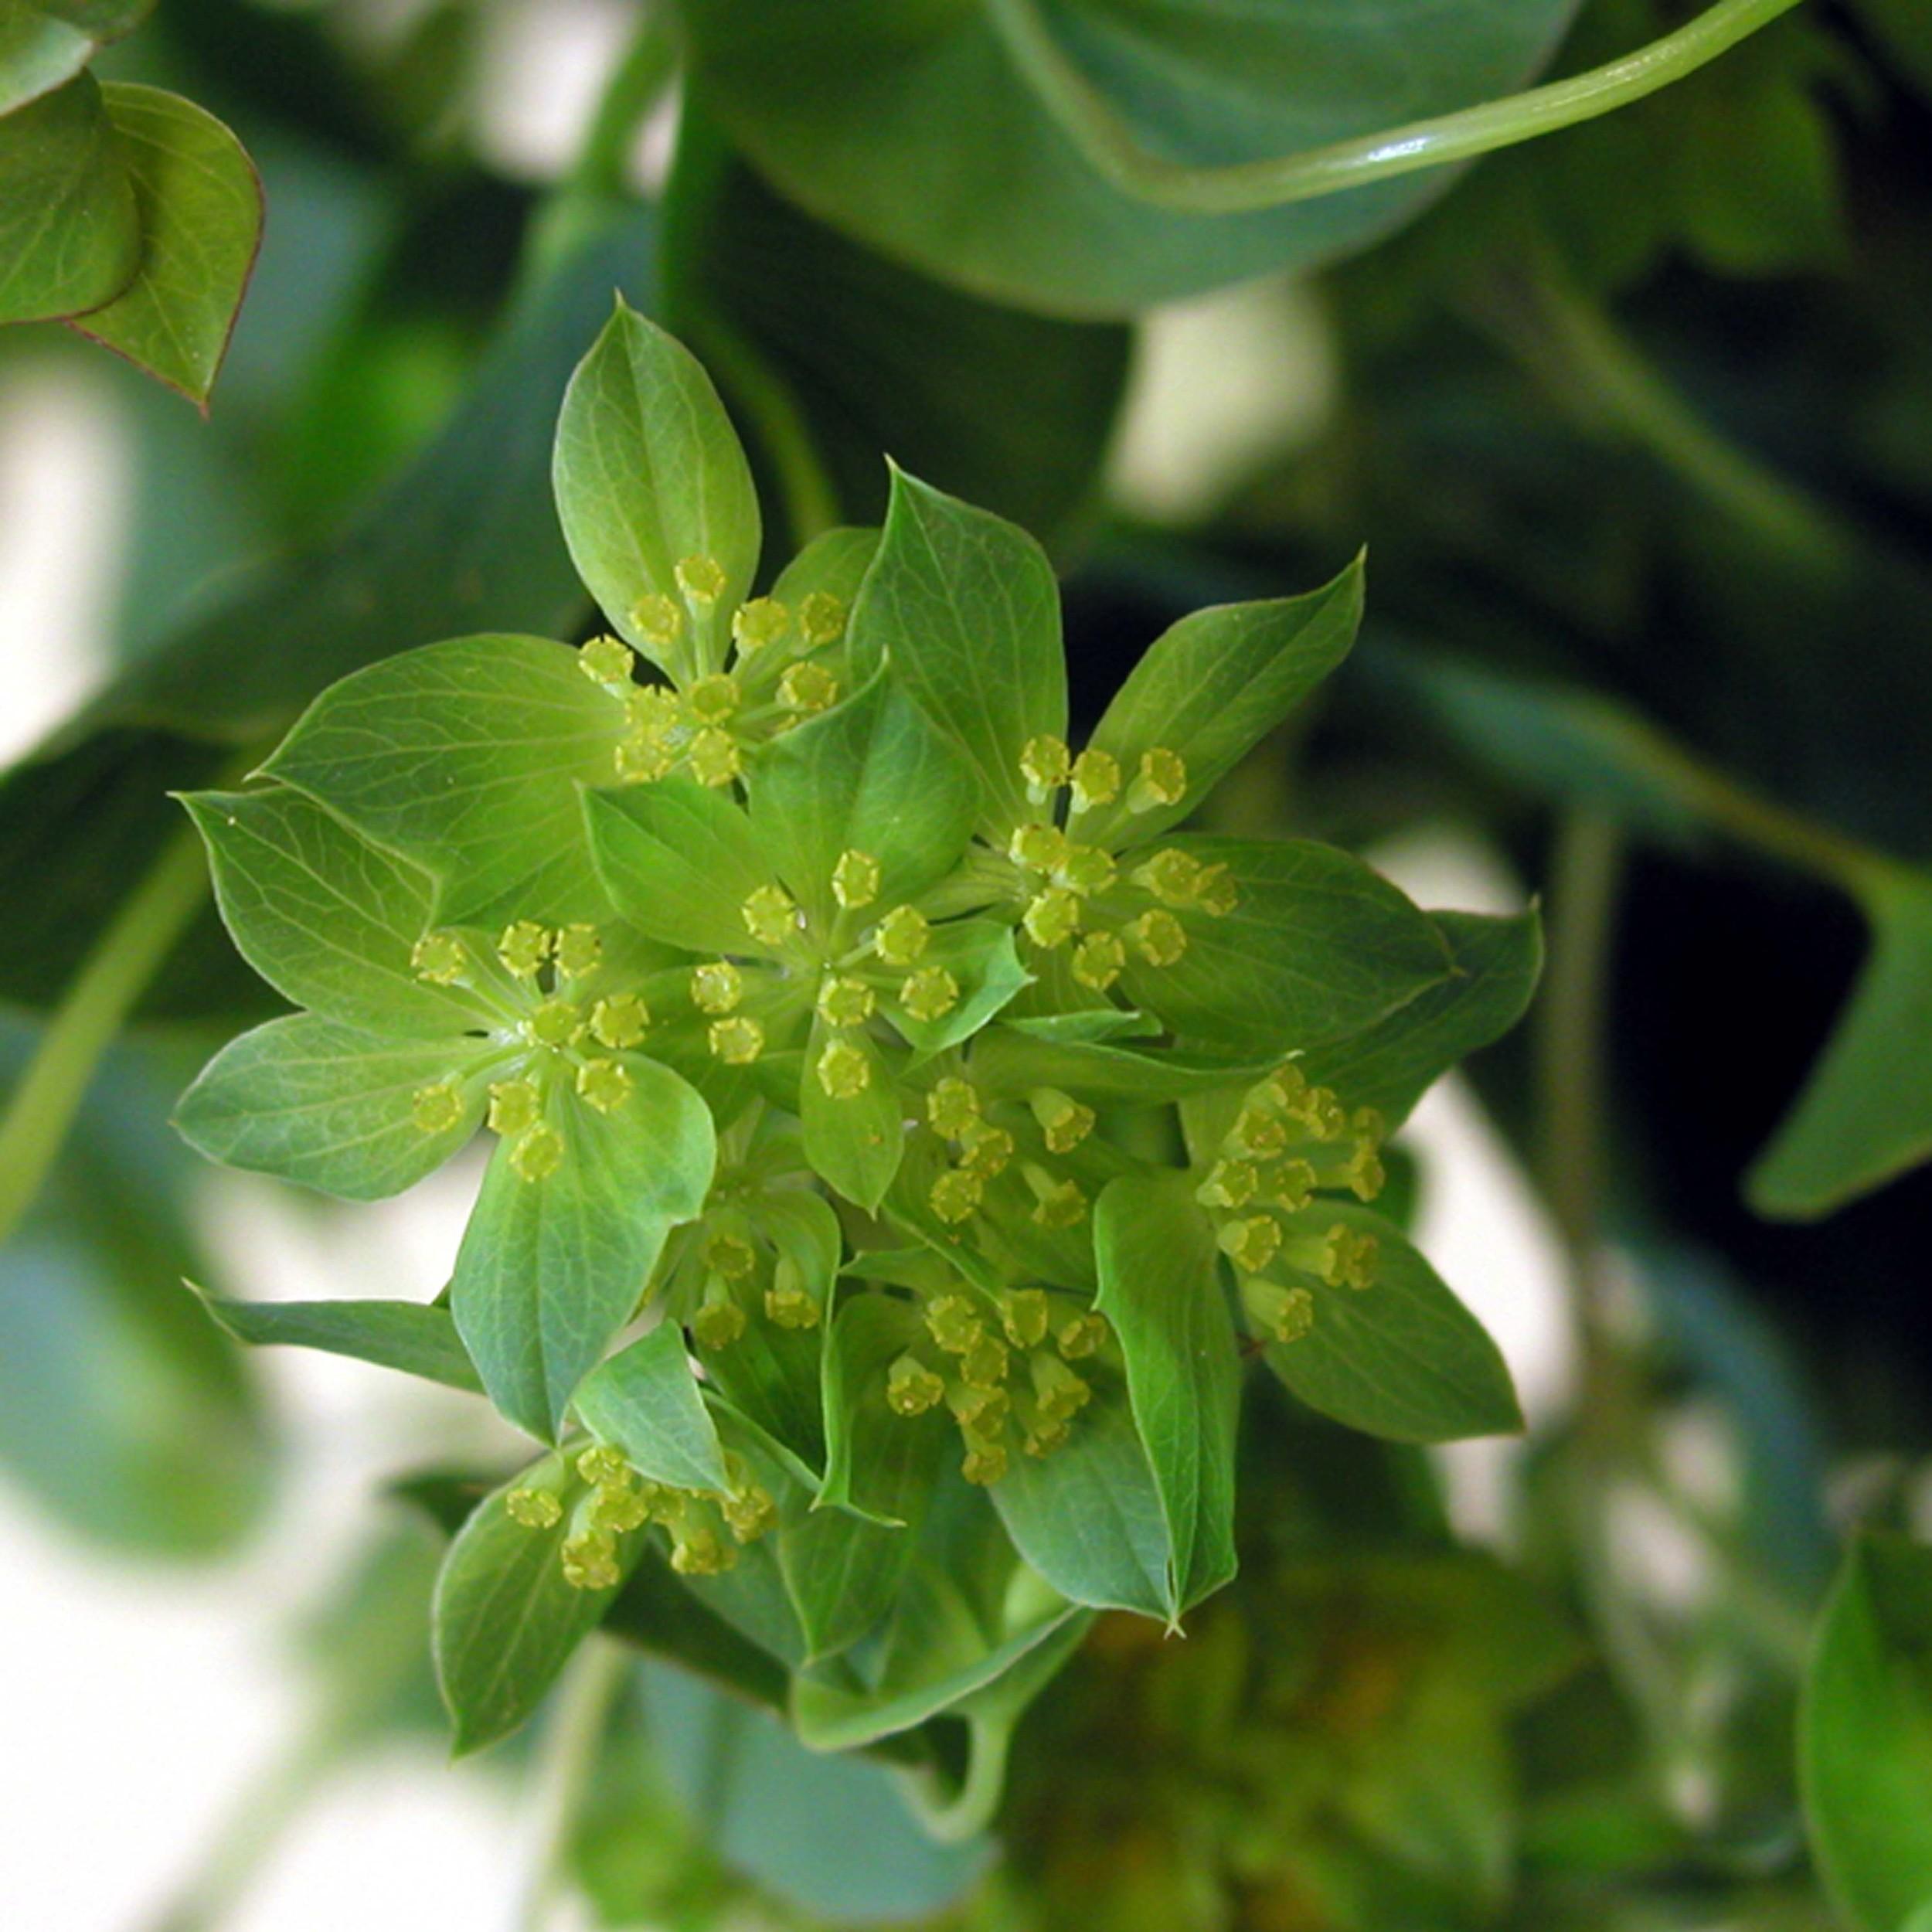 Closeup of Bupleurum flowers